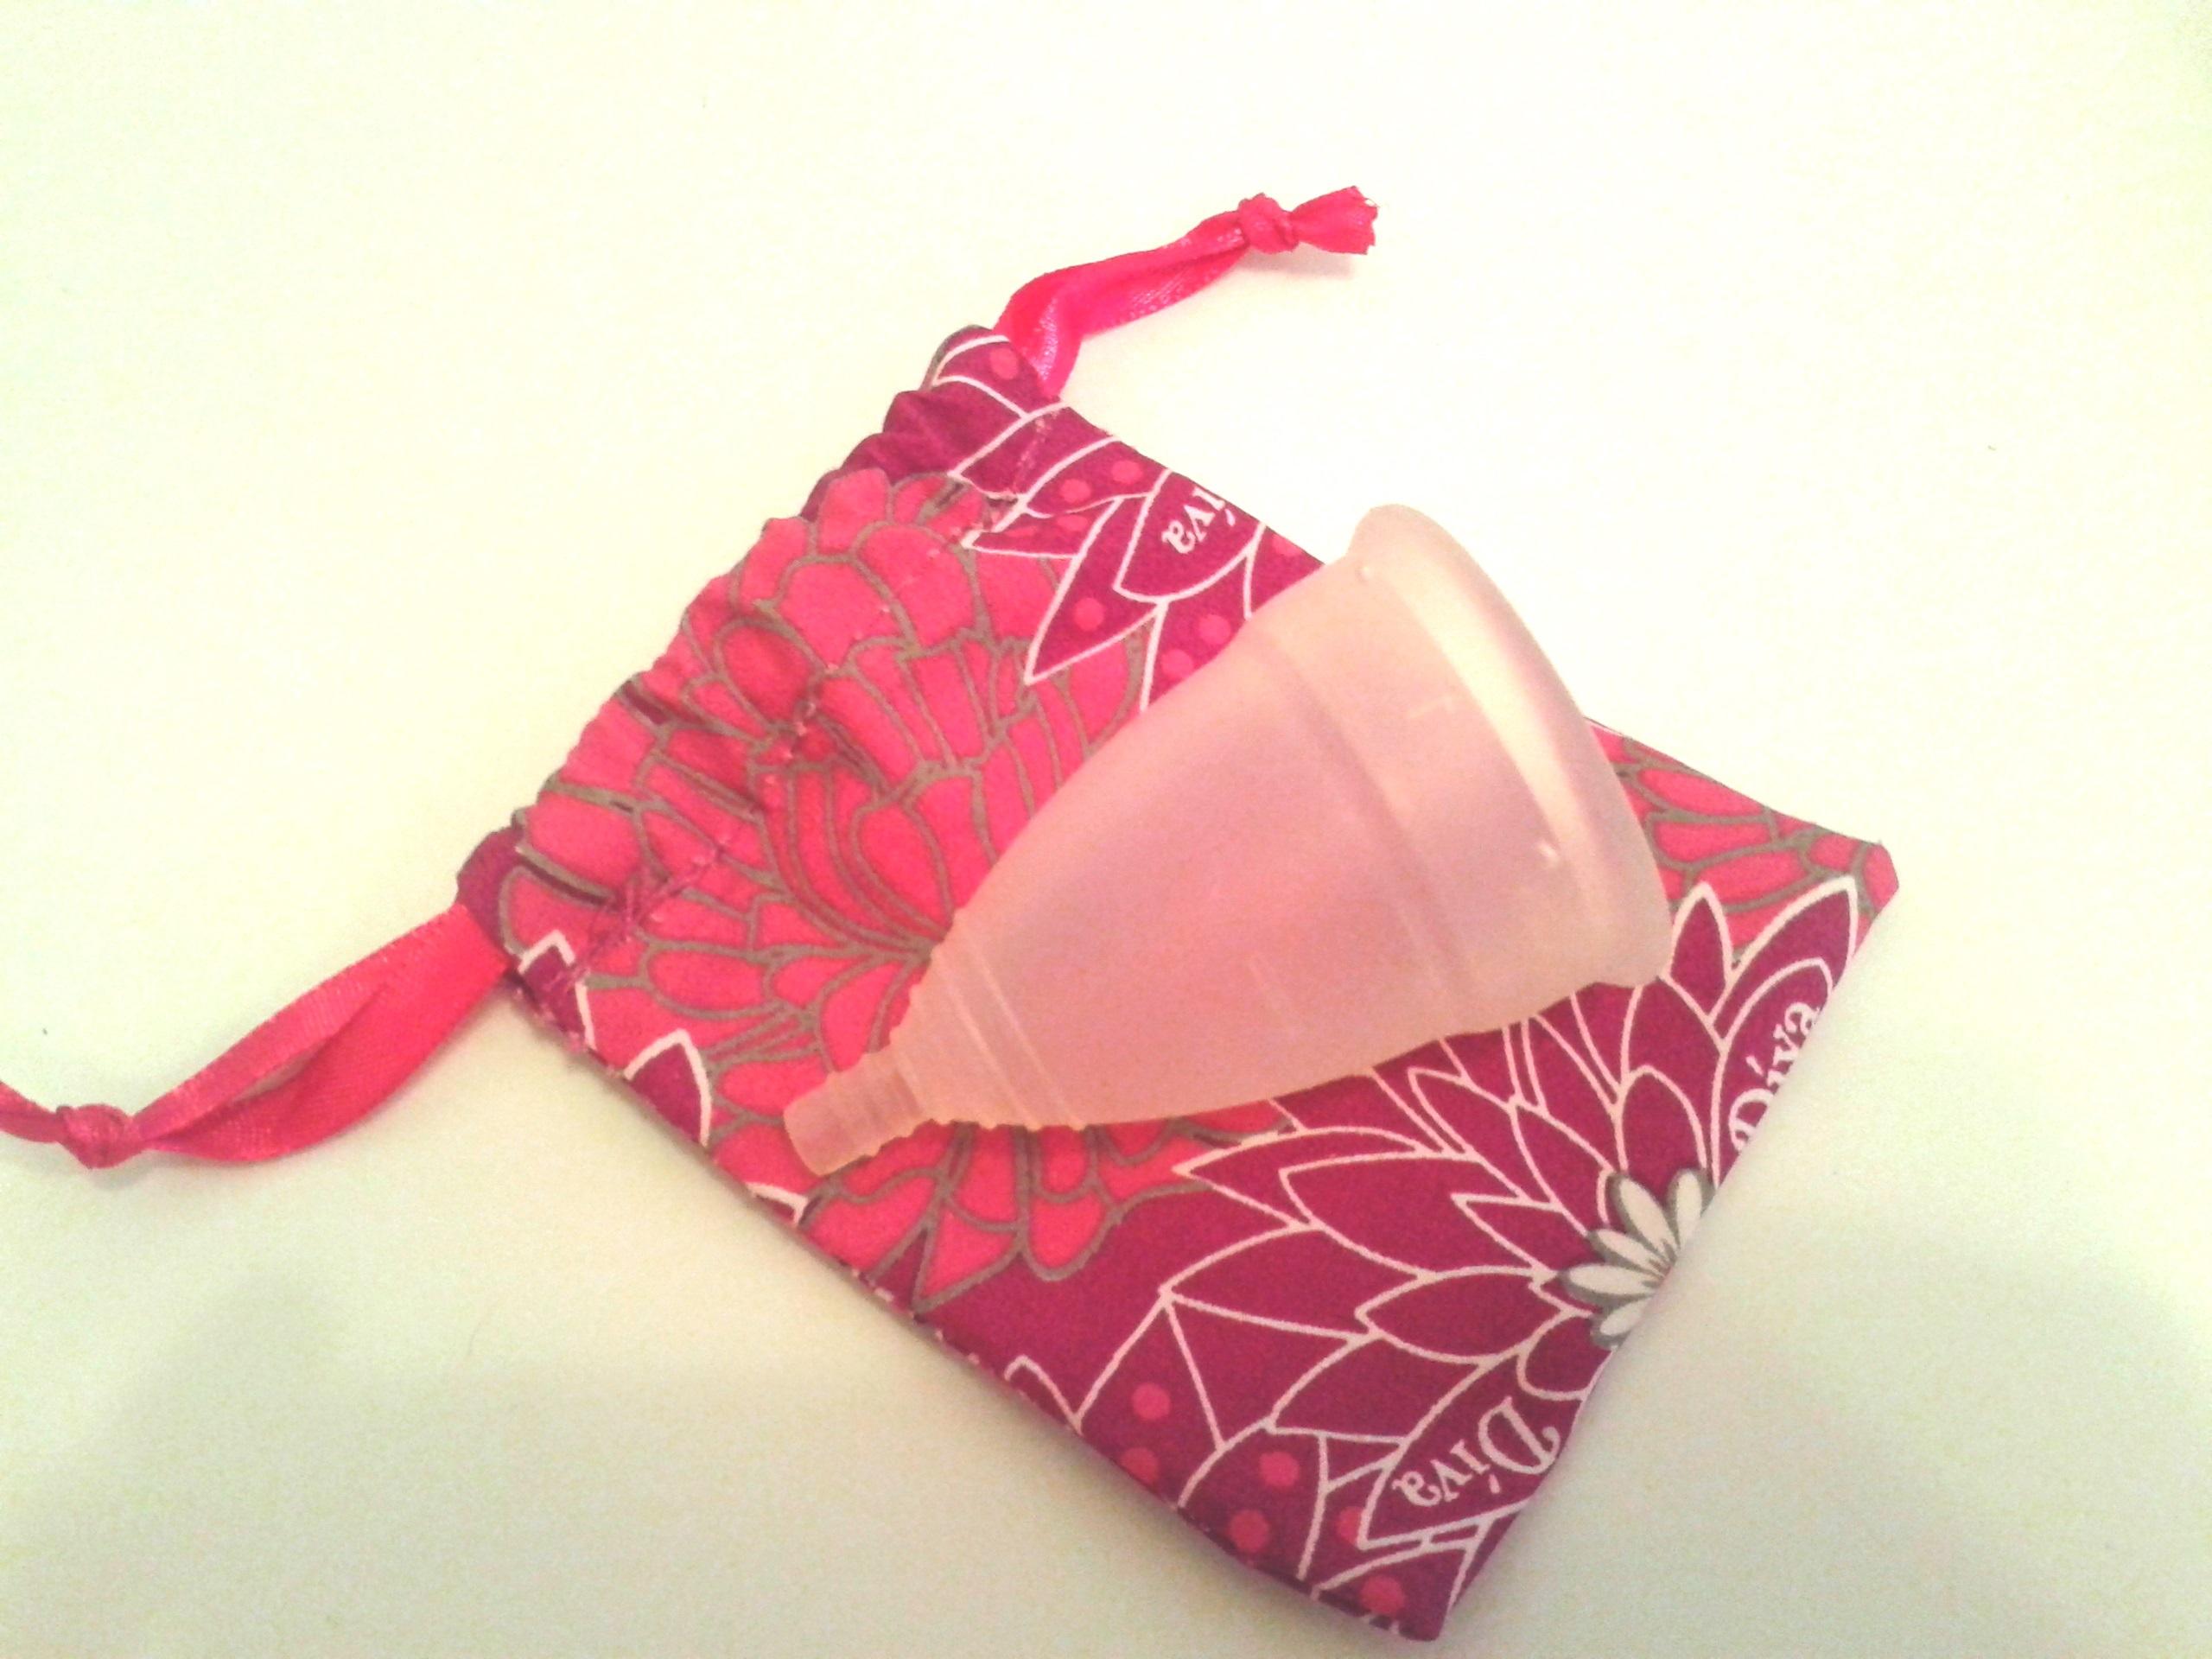 coupe menstruelle 1